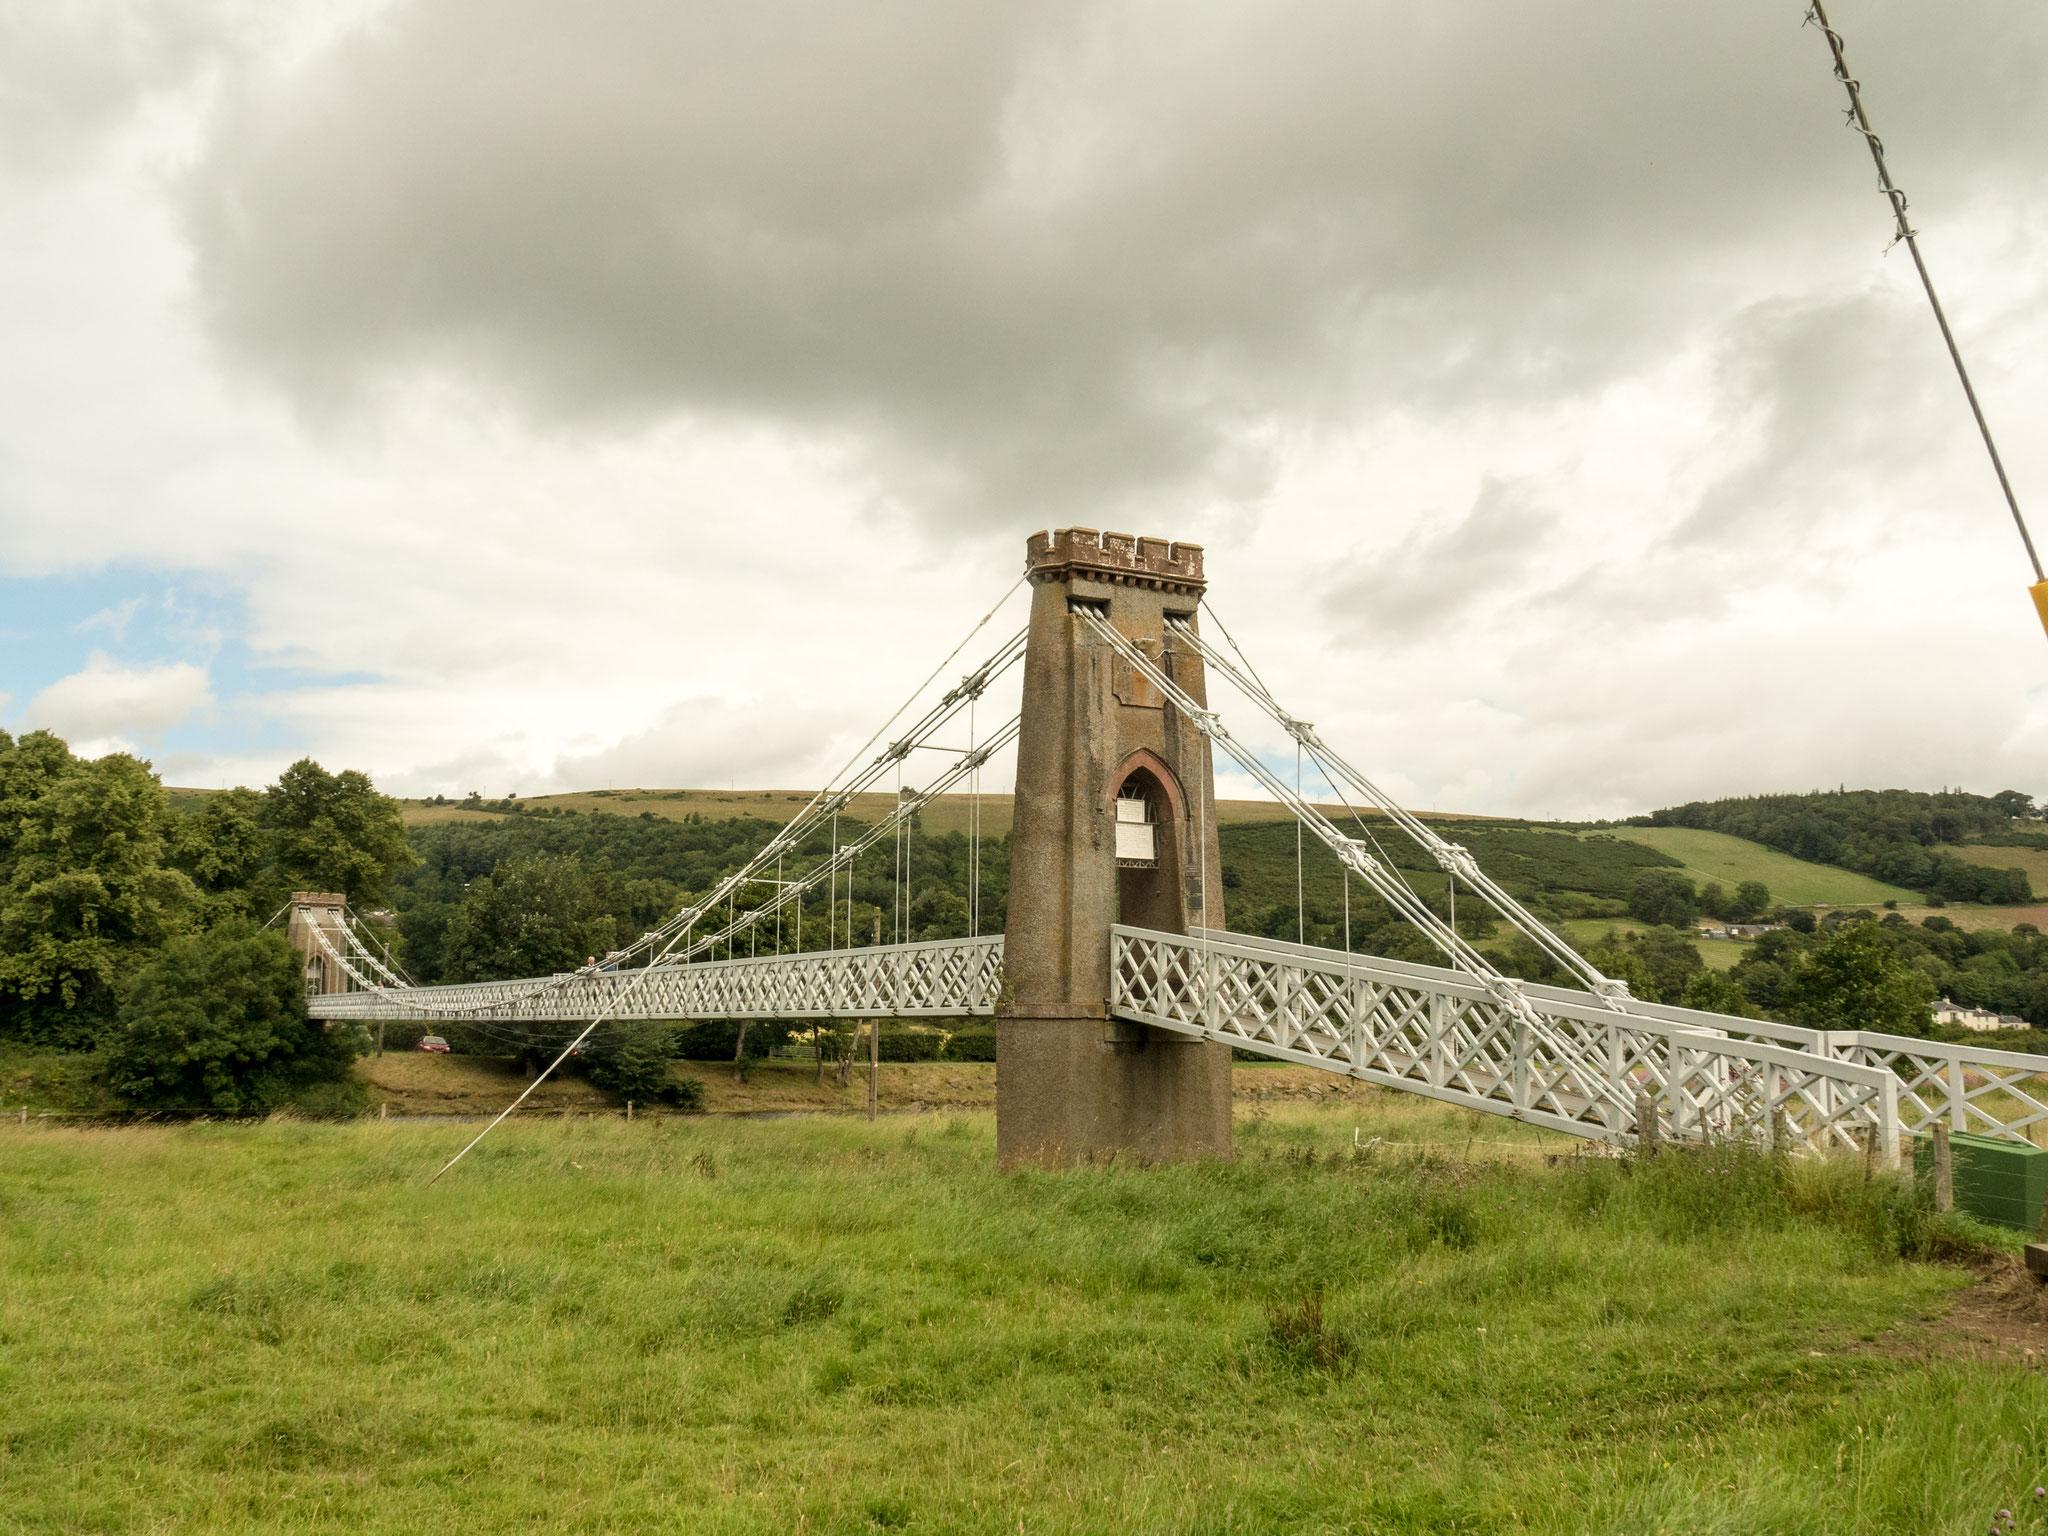 Bild: The Chain Bridge